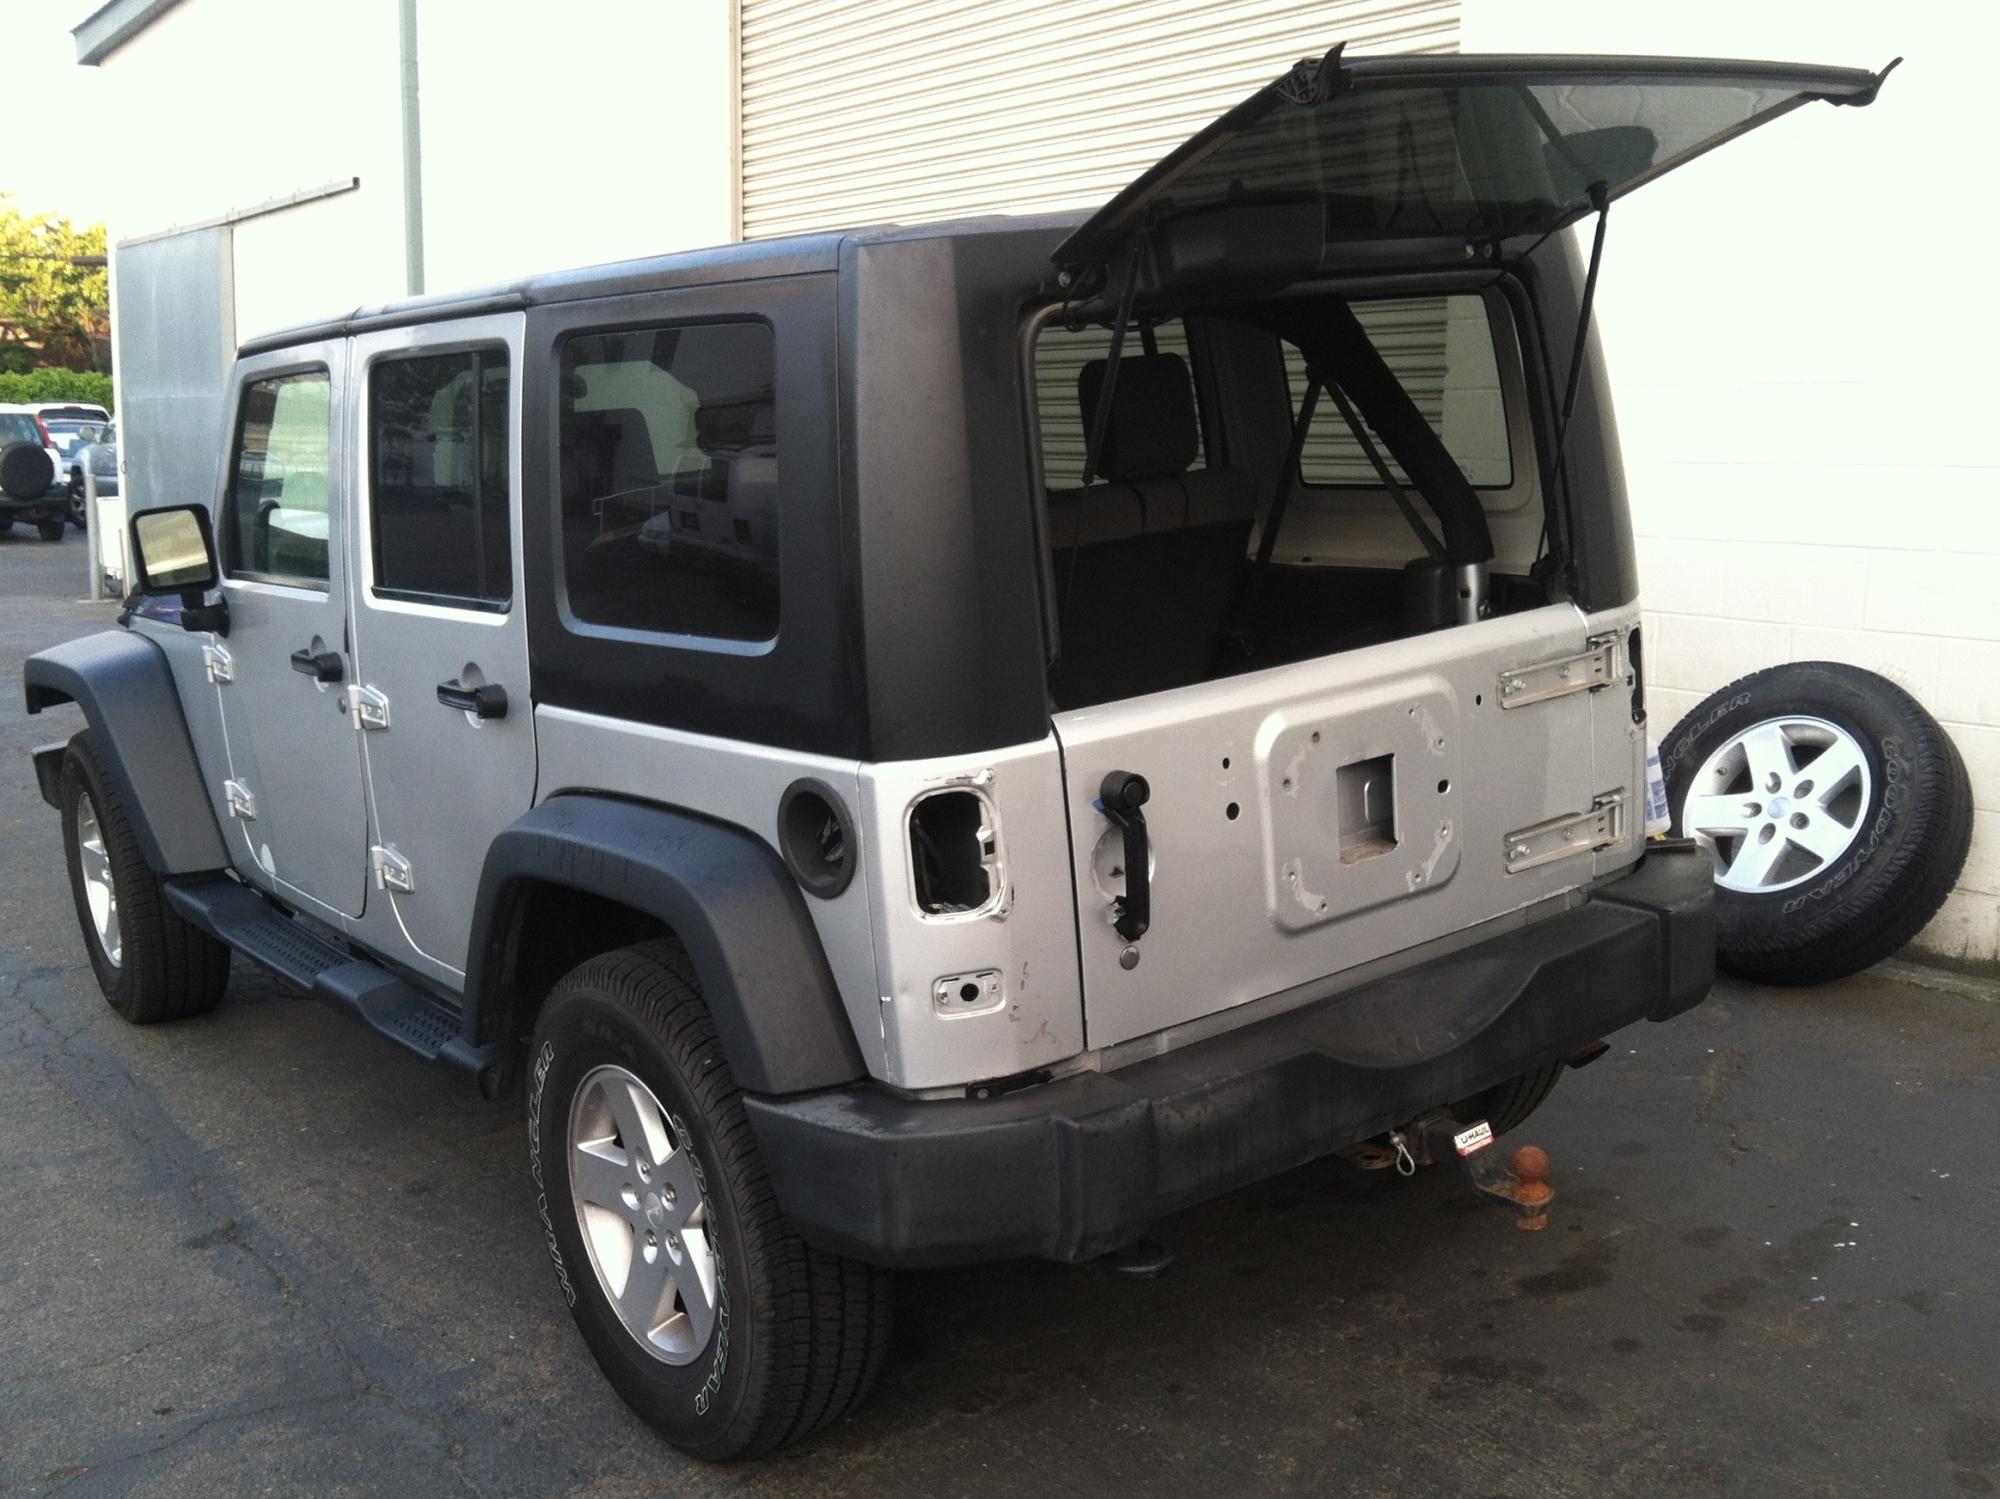 matte black jeep wrap 01 – Custom Vehicle Wraps